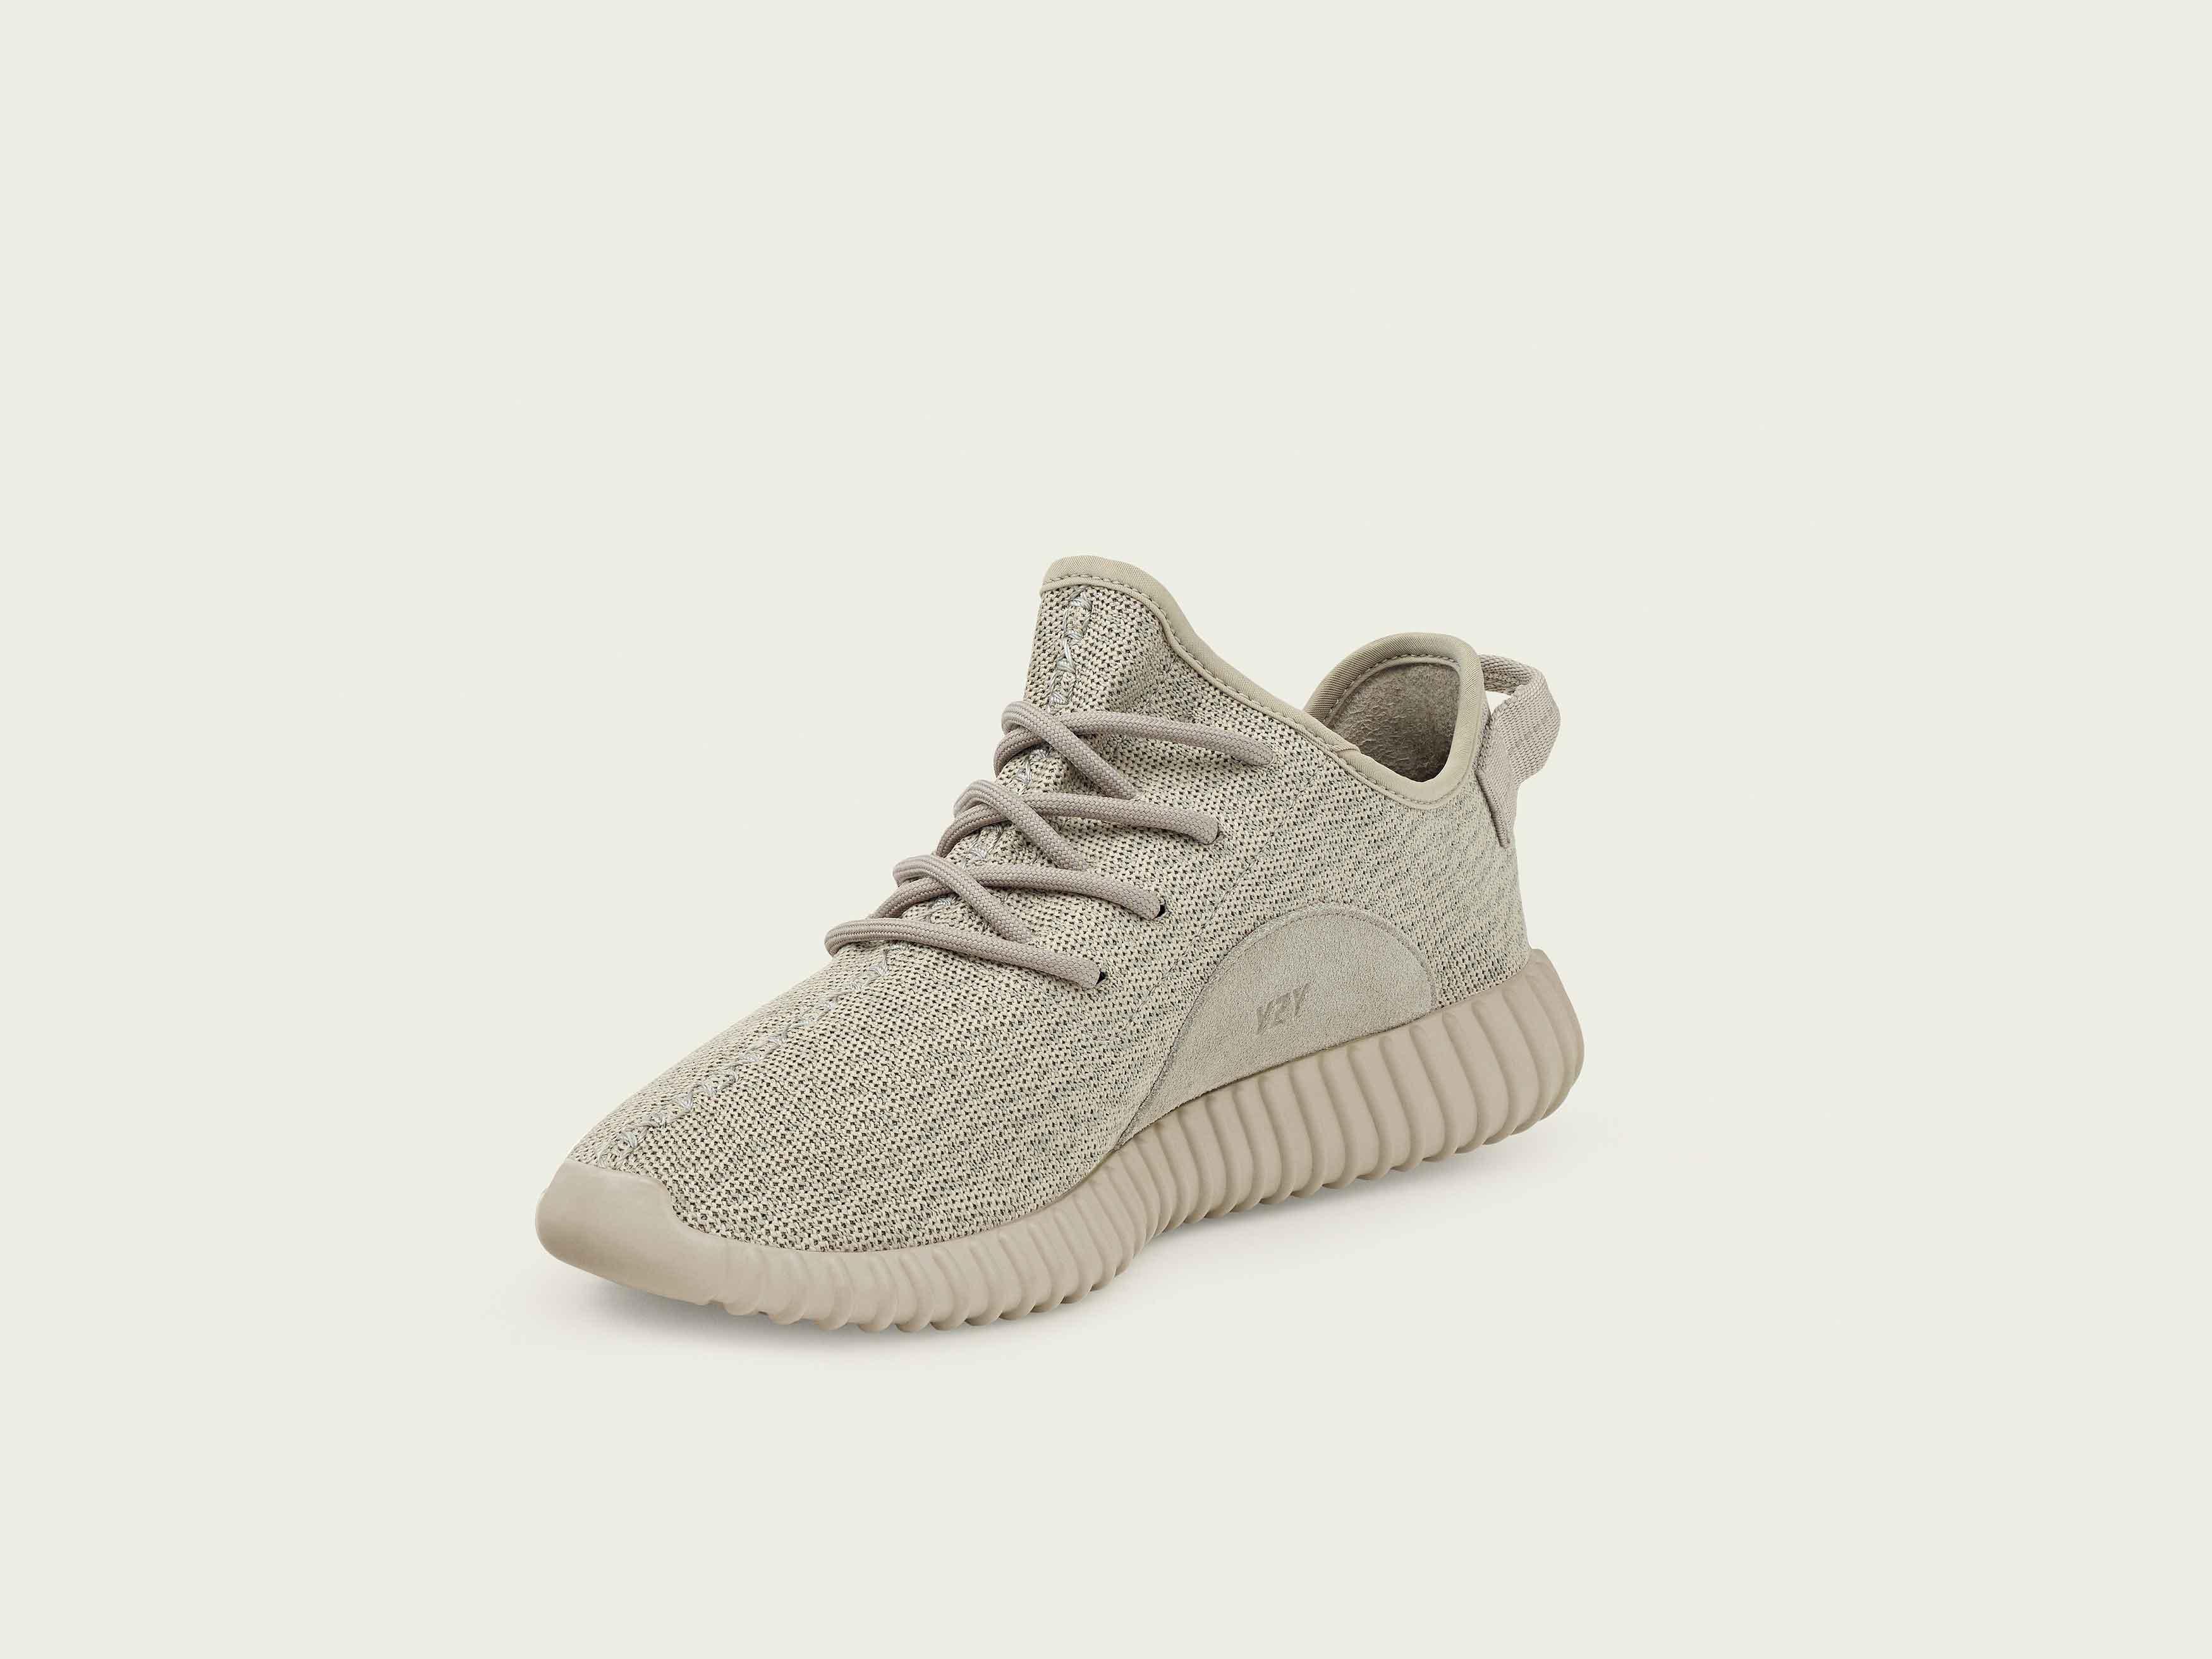 Adidas Yeezy Boost Price Ph